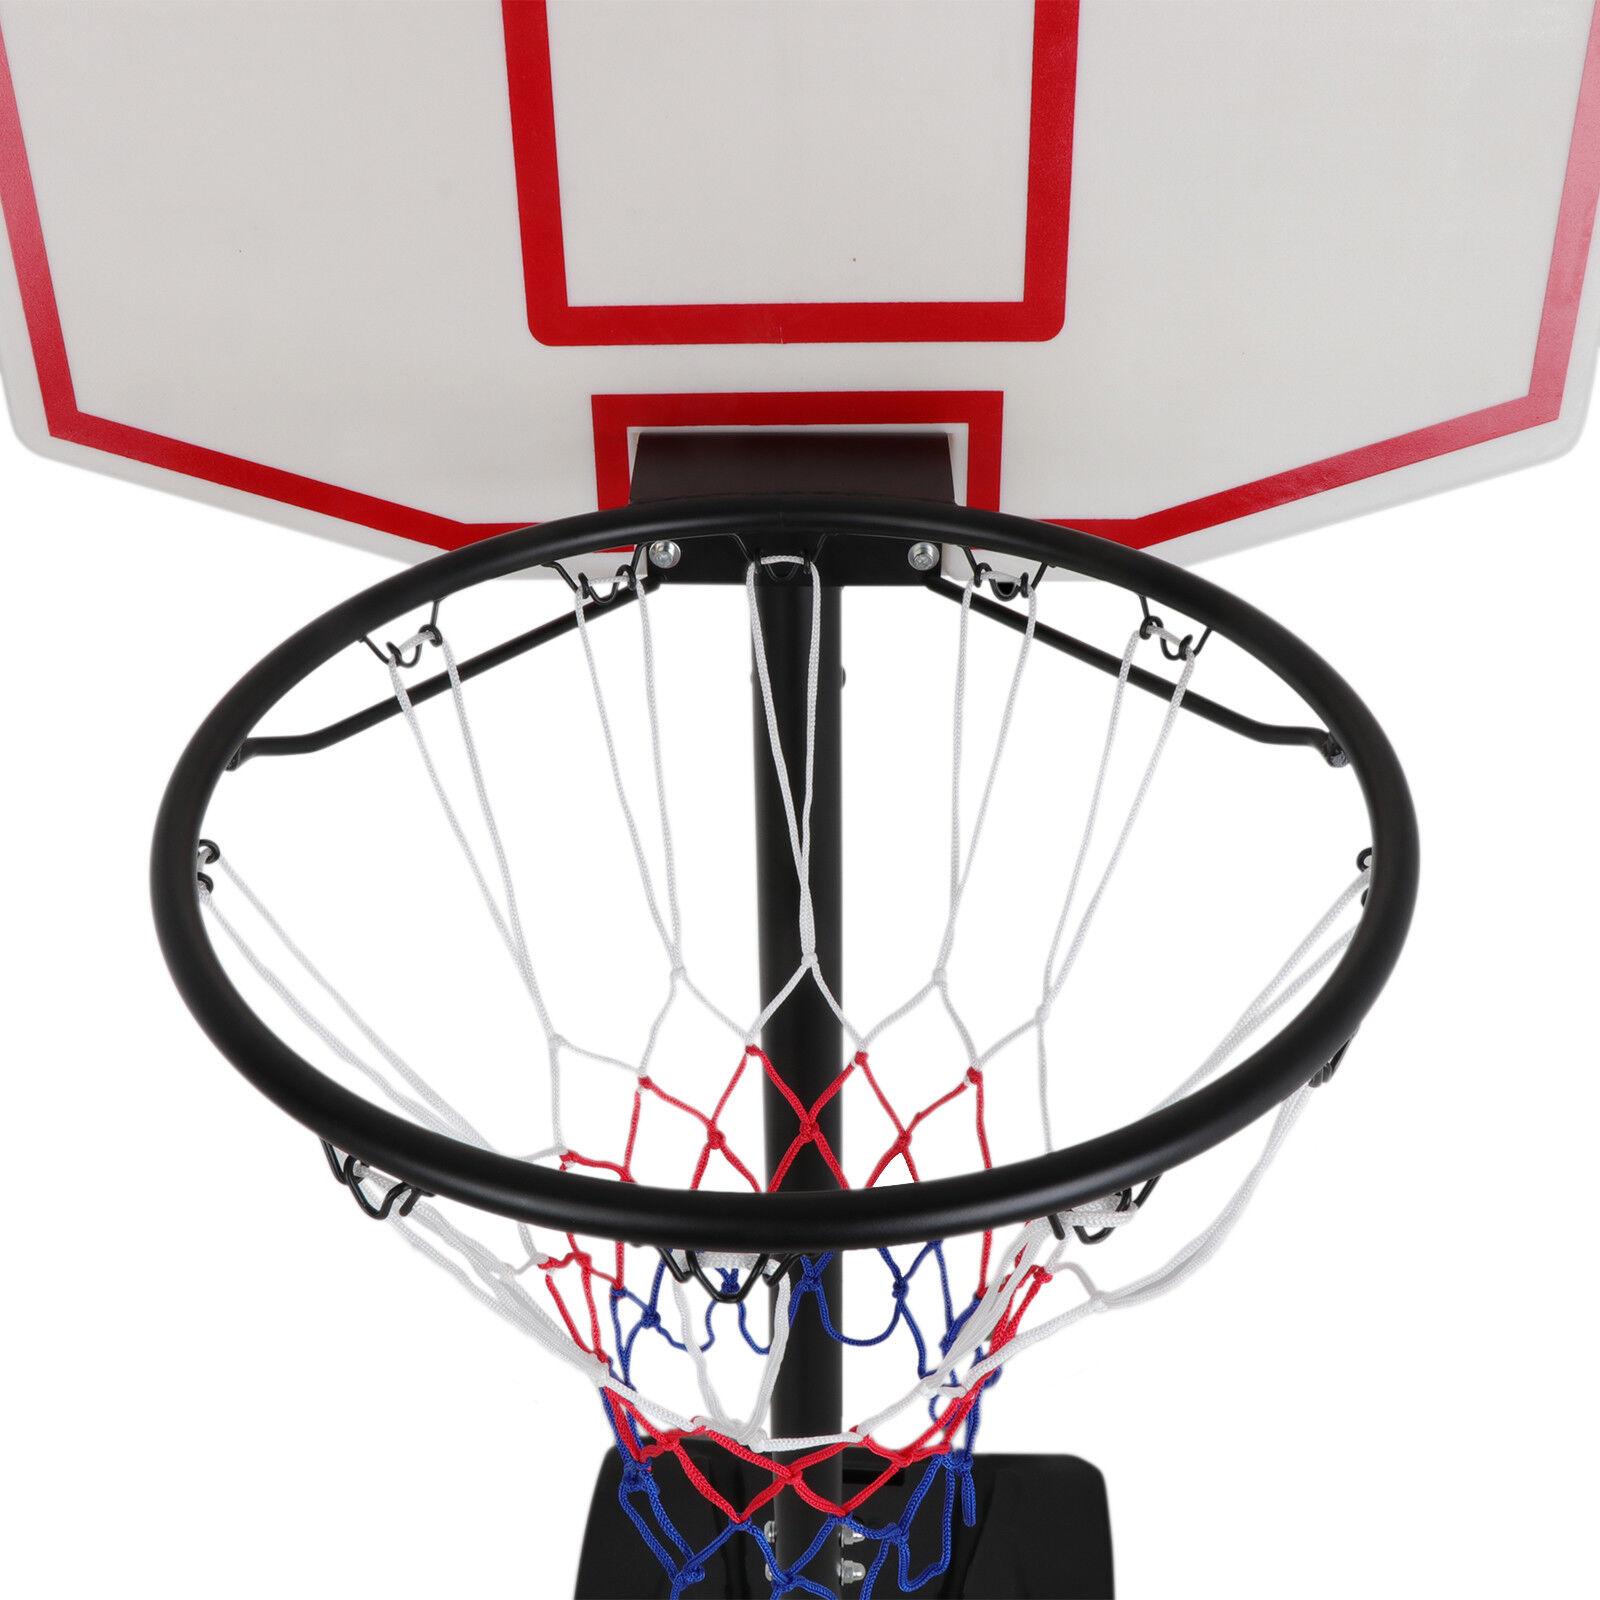 Image 21 - Pro-7ft-Basketball-Hoop-Adjustable-Height-Portable-Backboard-System-Junior-Kid